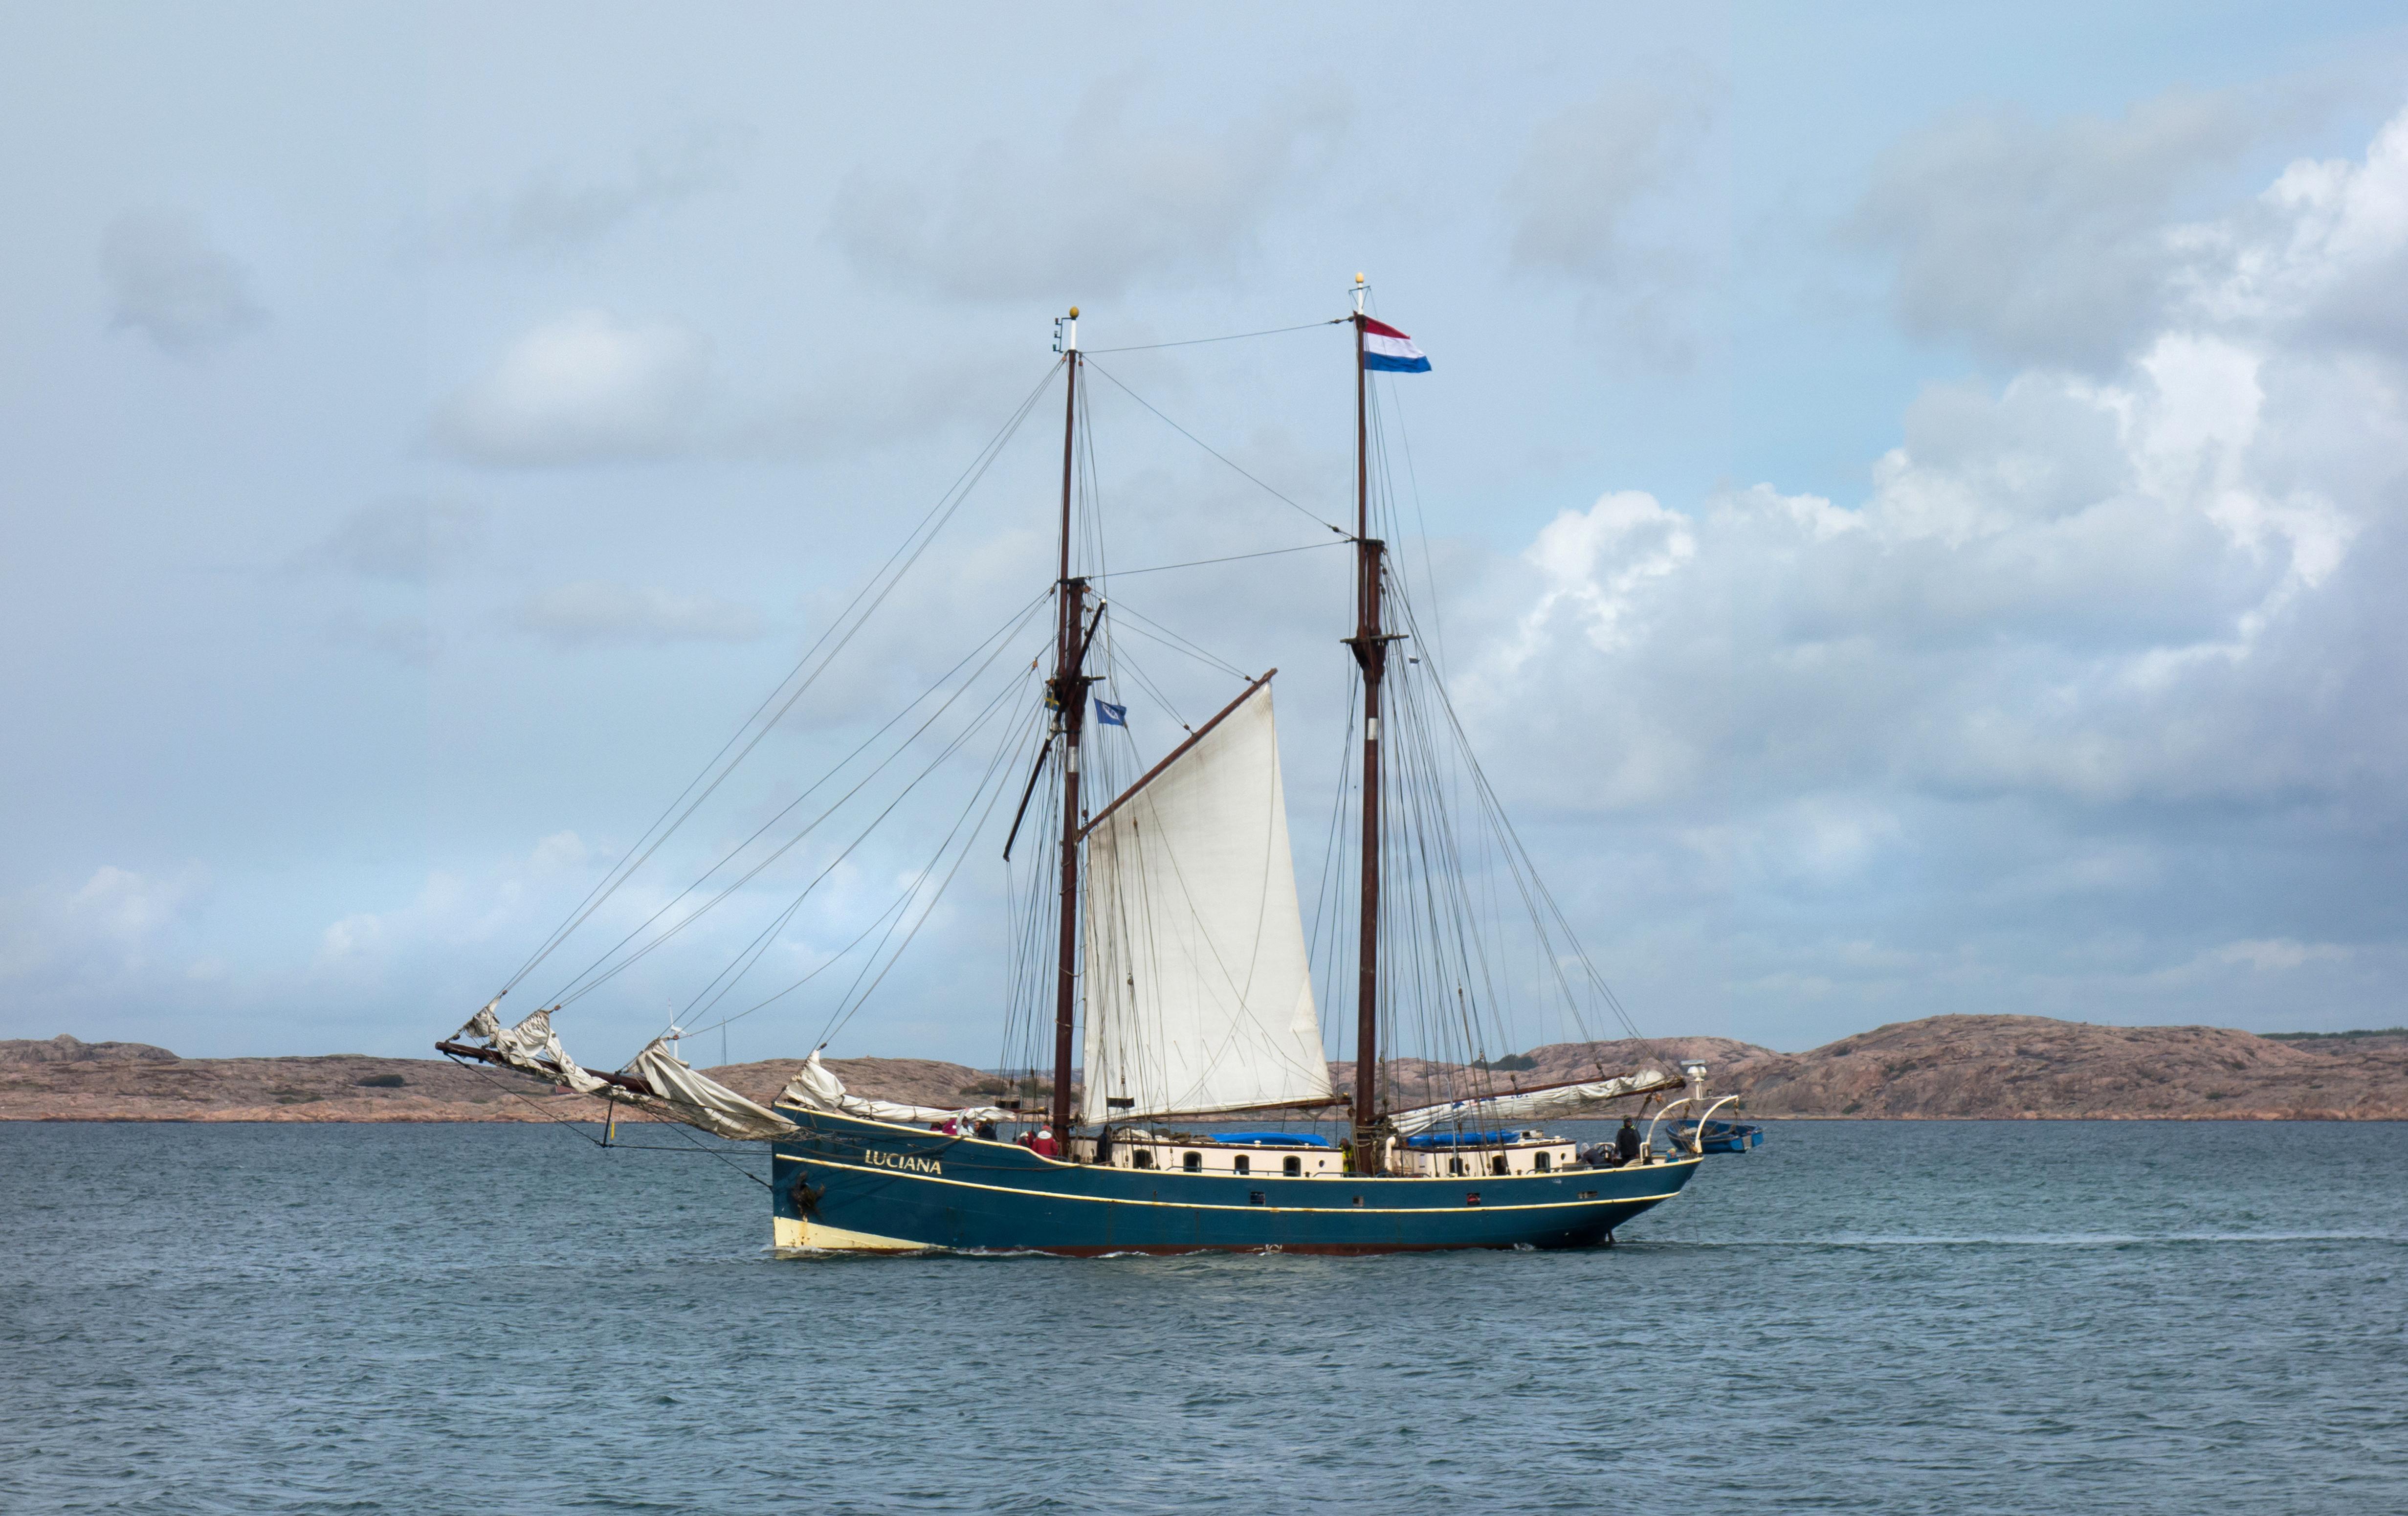 Luciana visiting Lysekil 1, Boat, Cliffs, Lysekil, Ocean, HQ Photo